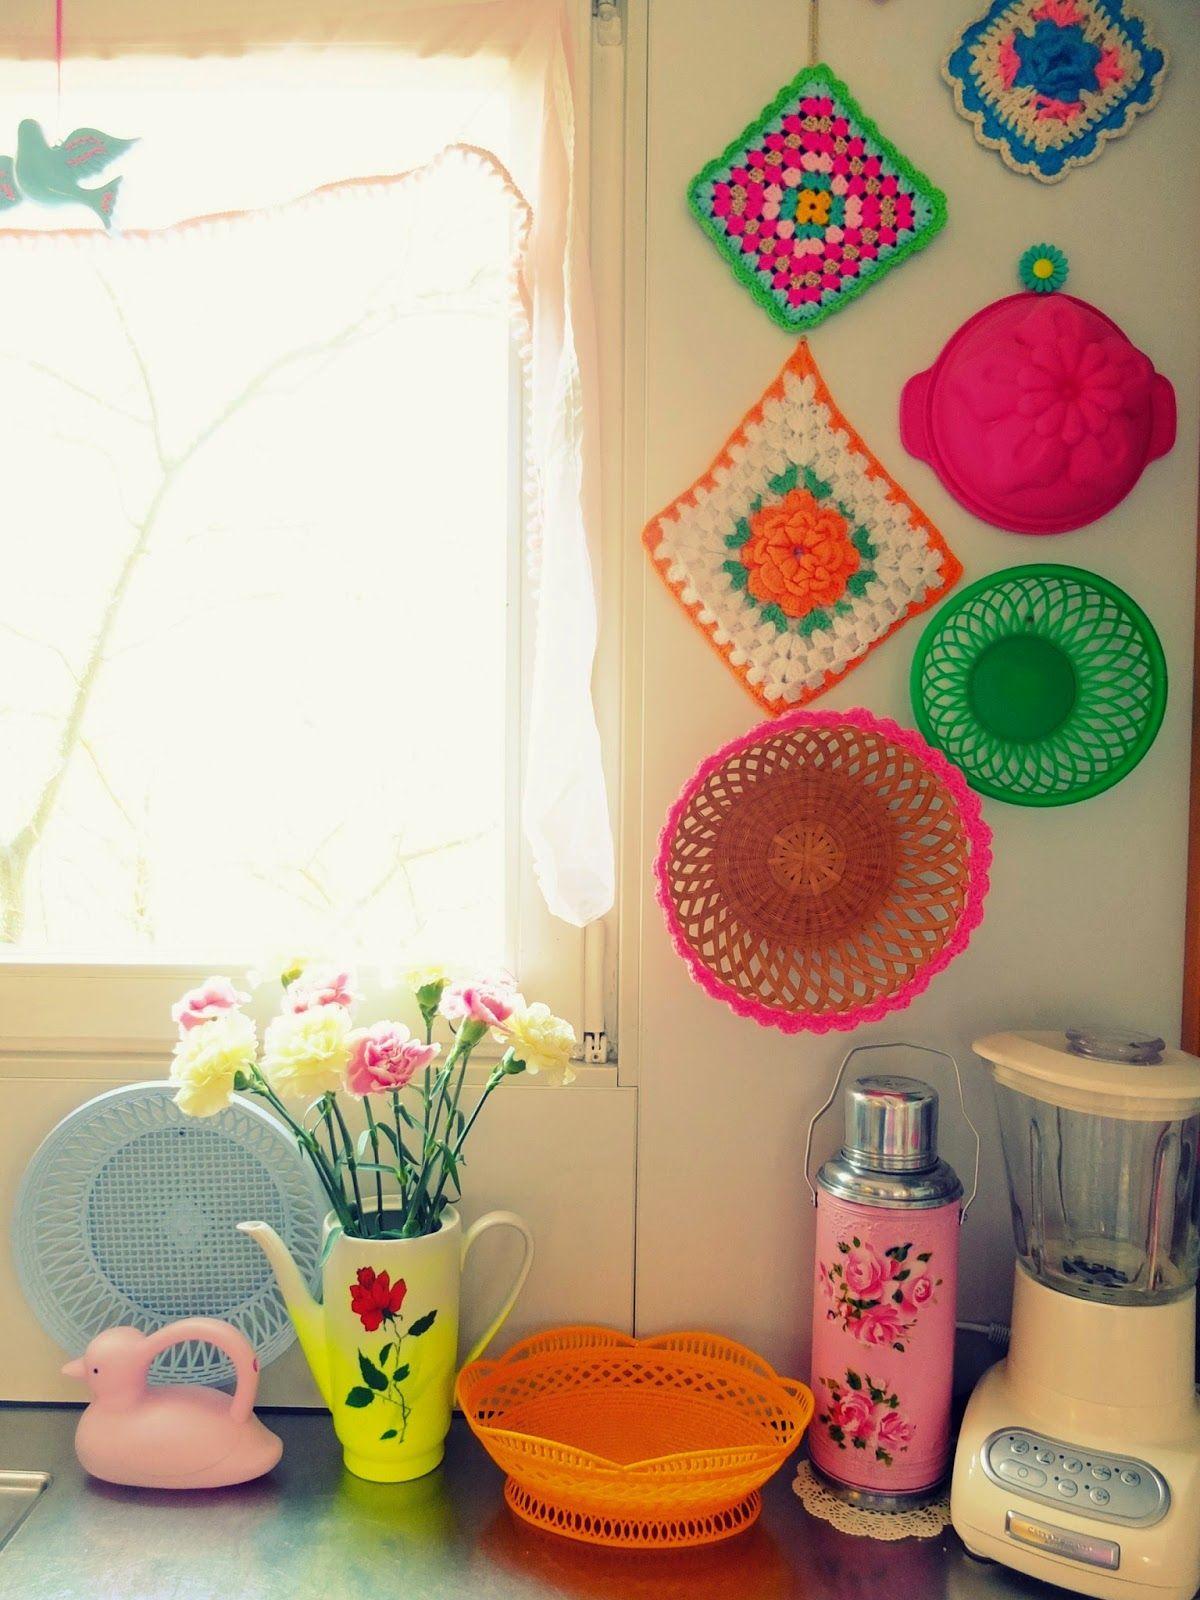 http://jansschwester.blogspot.de/2015/03/happy-house-nice-things-3.html